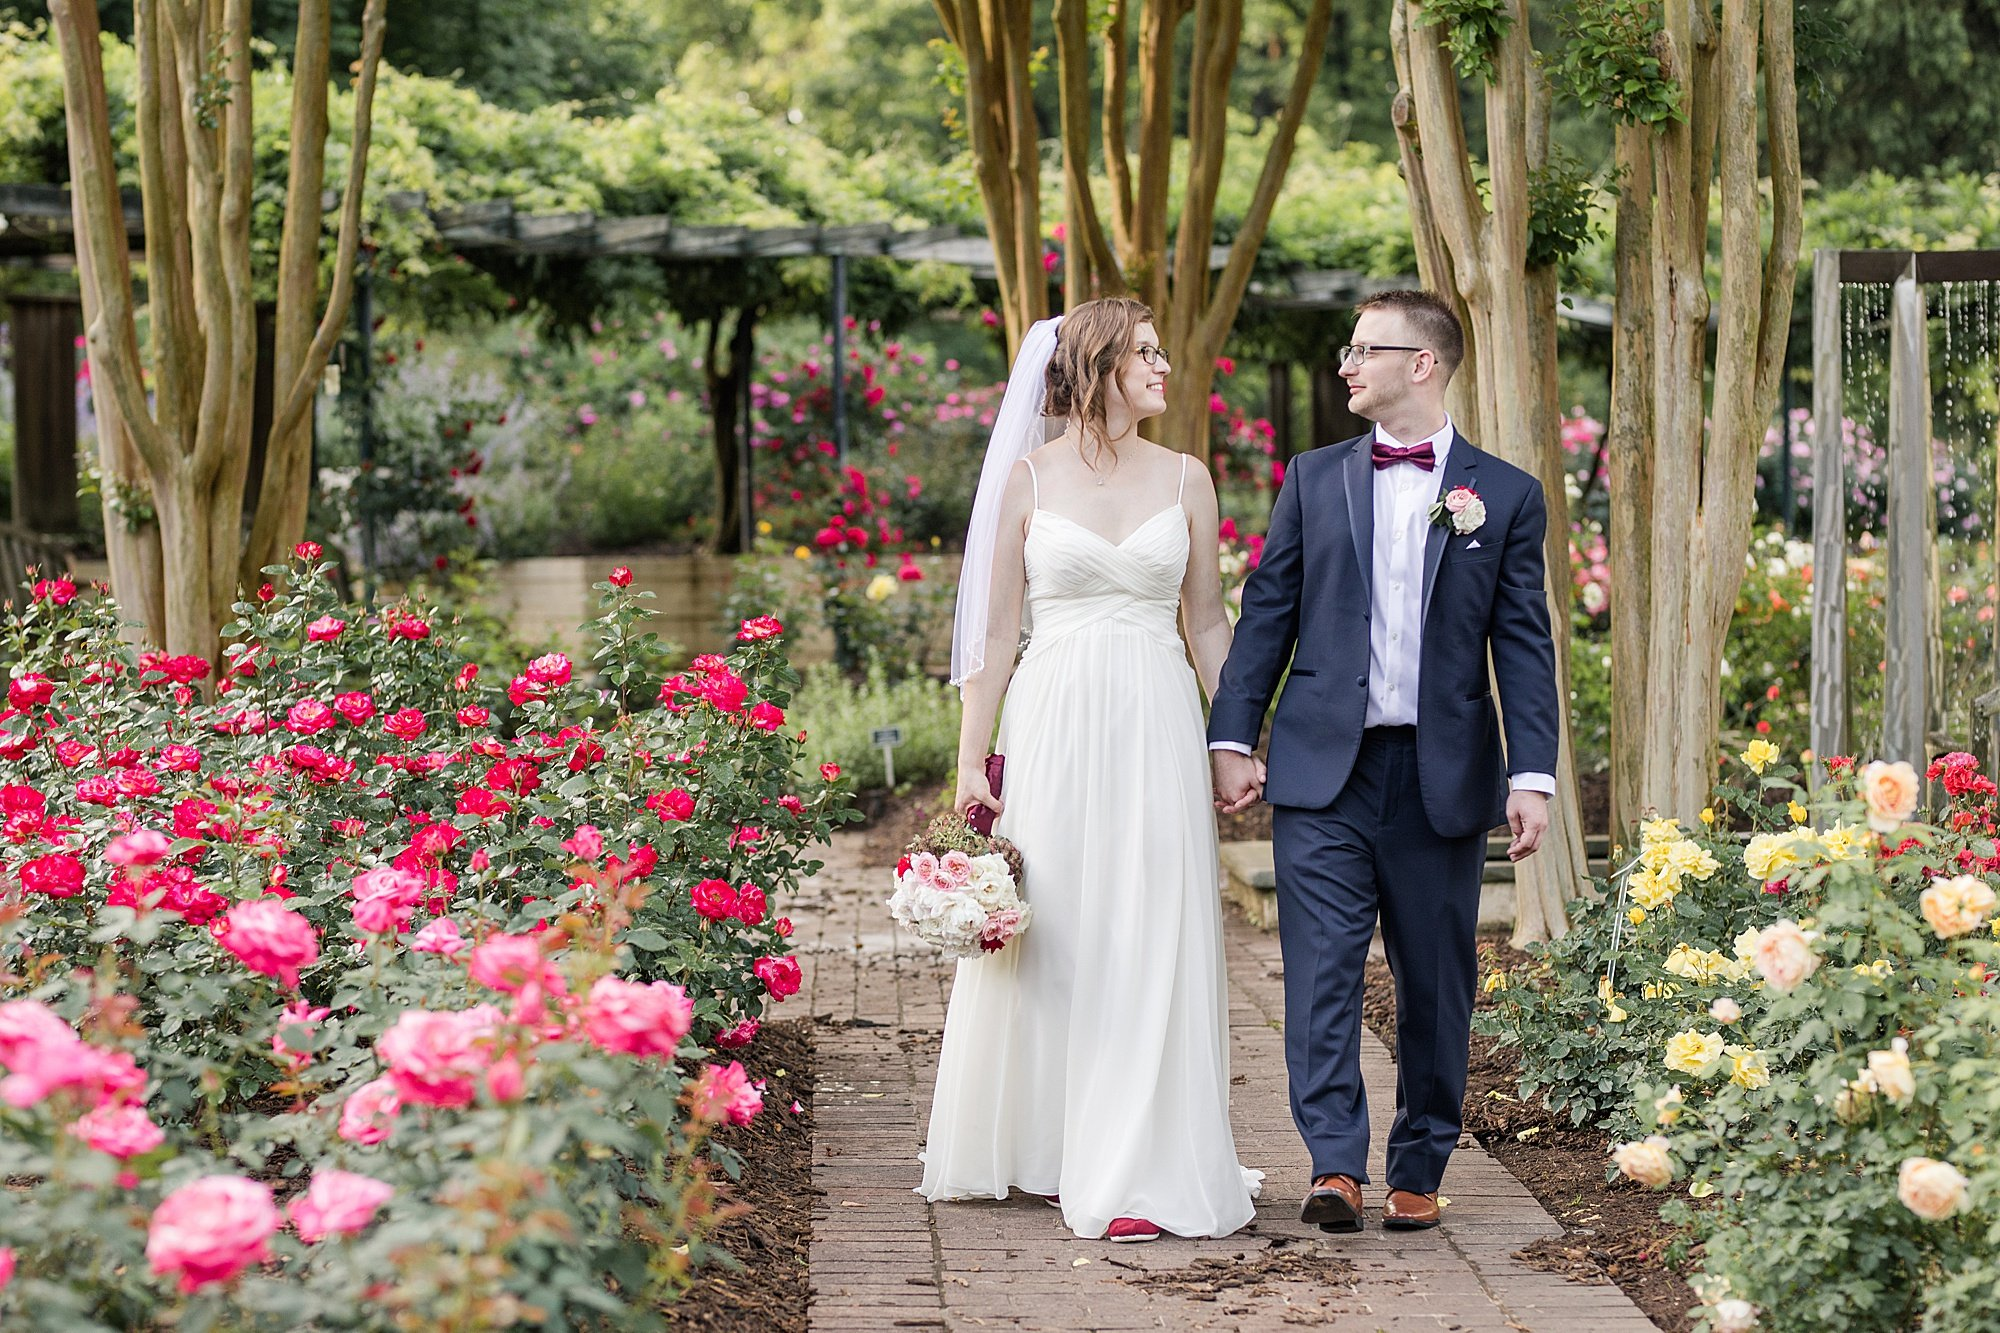 Brookside Garden Wedding in Rose Garden